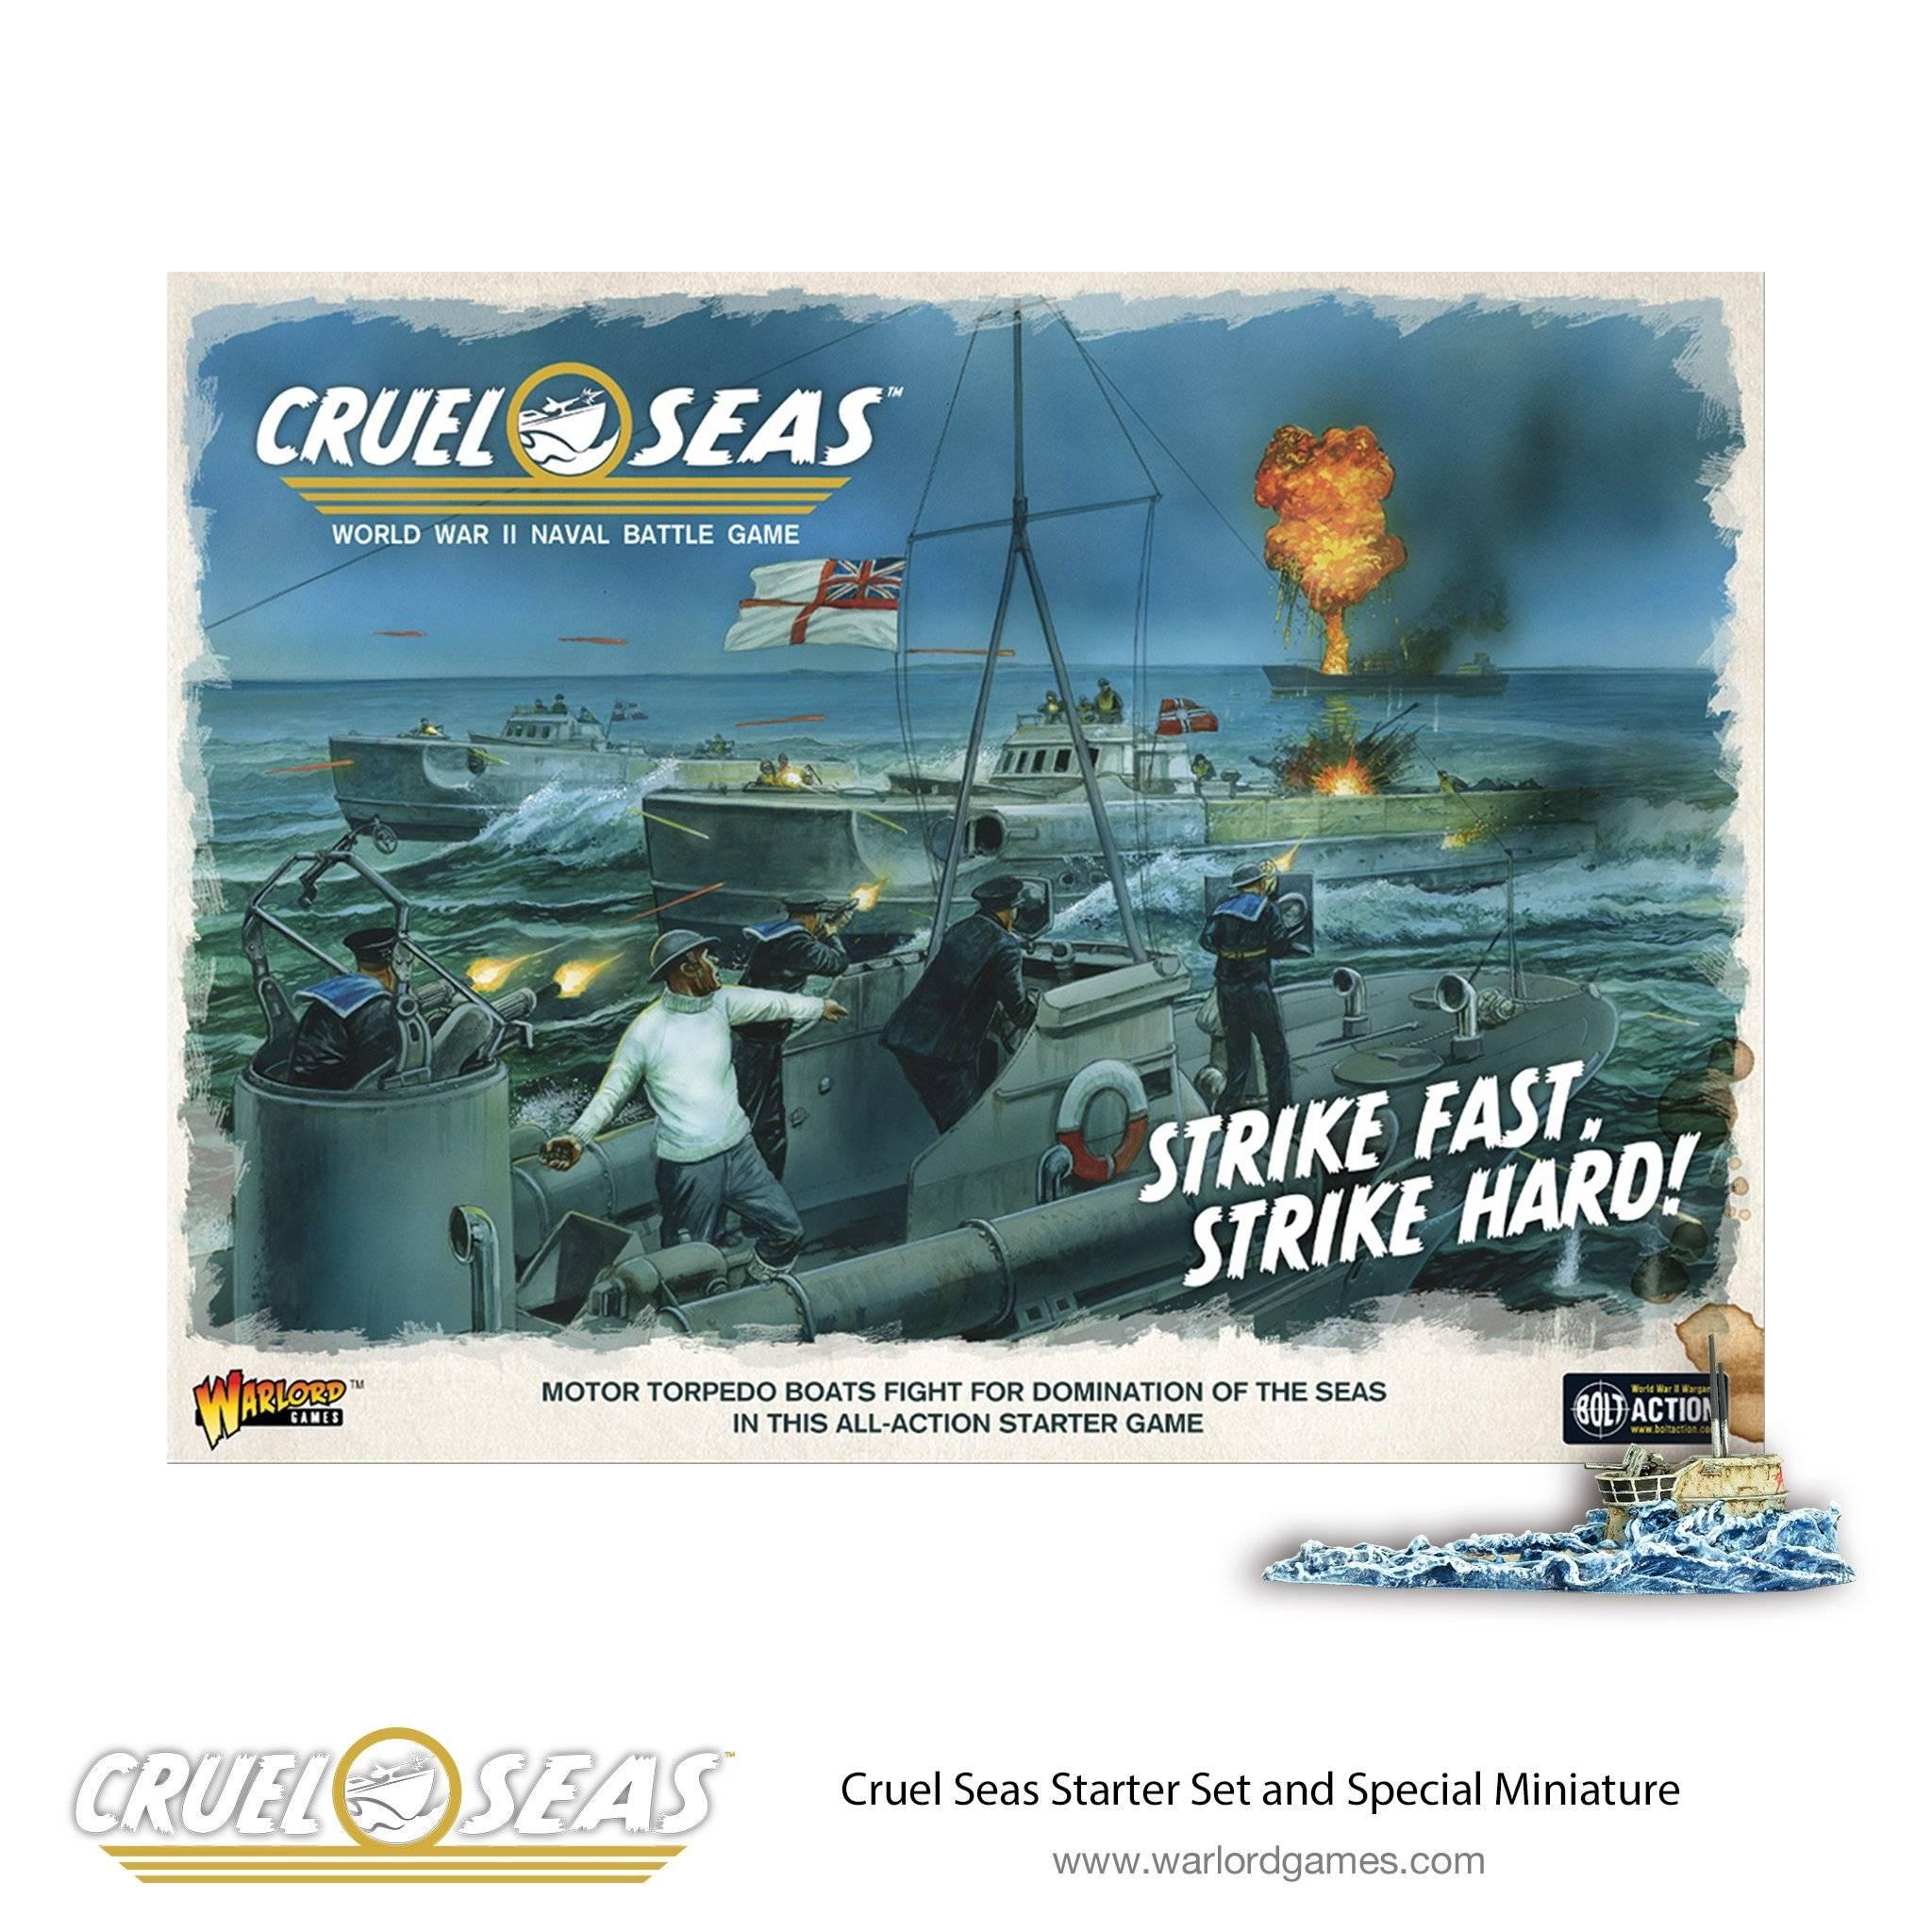 Cruel Seas - Starter set